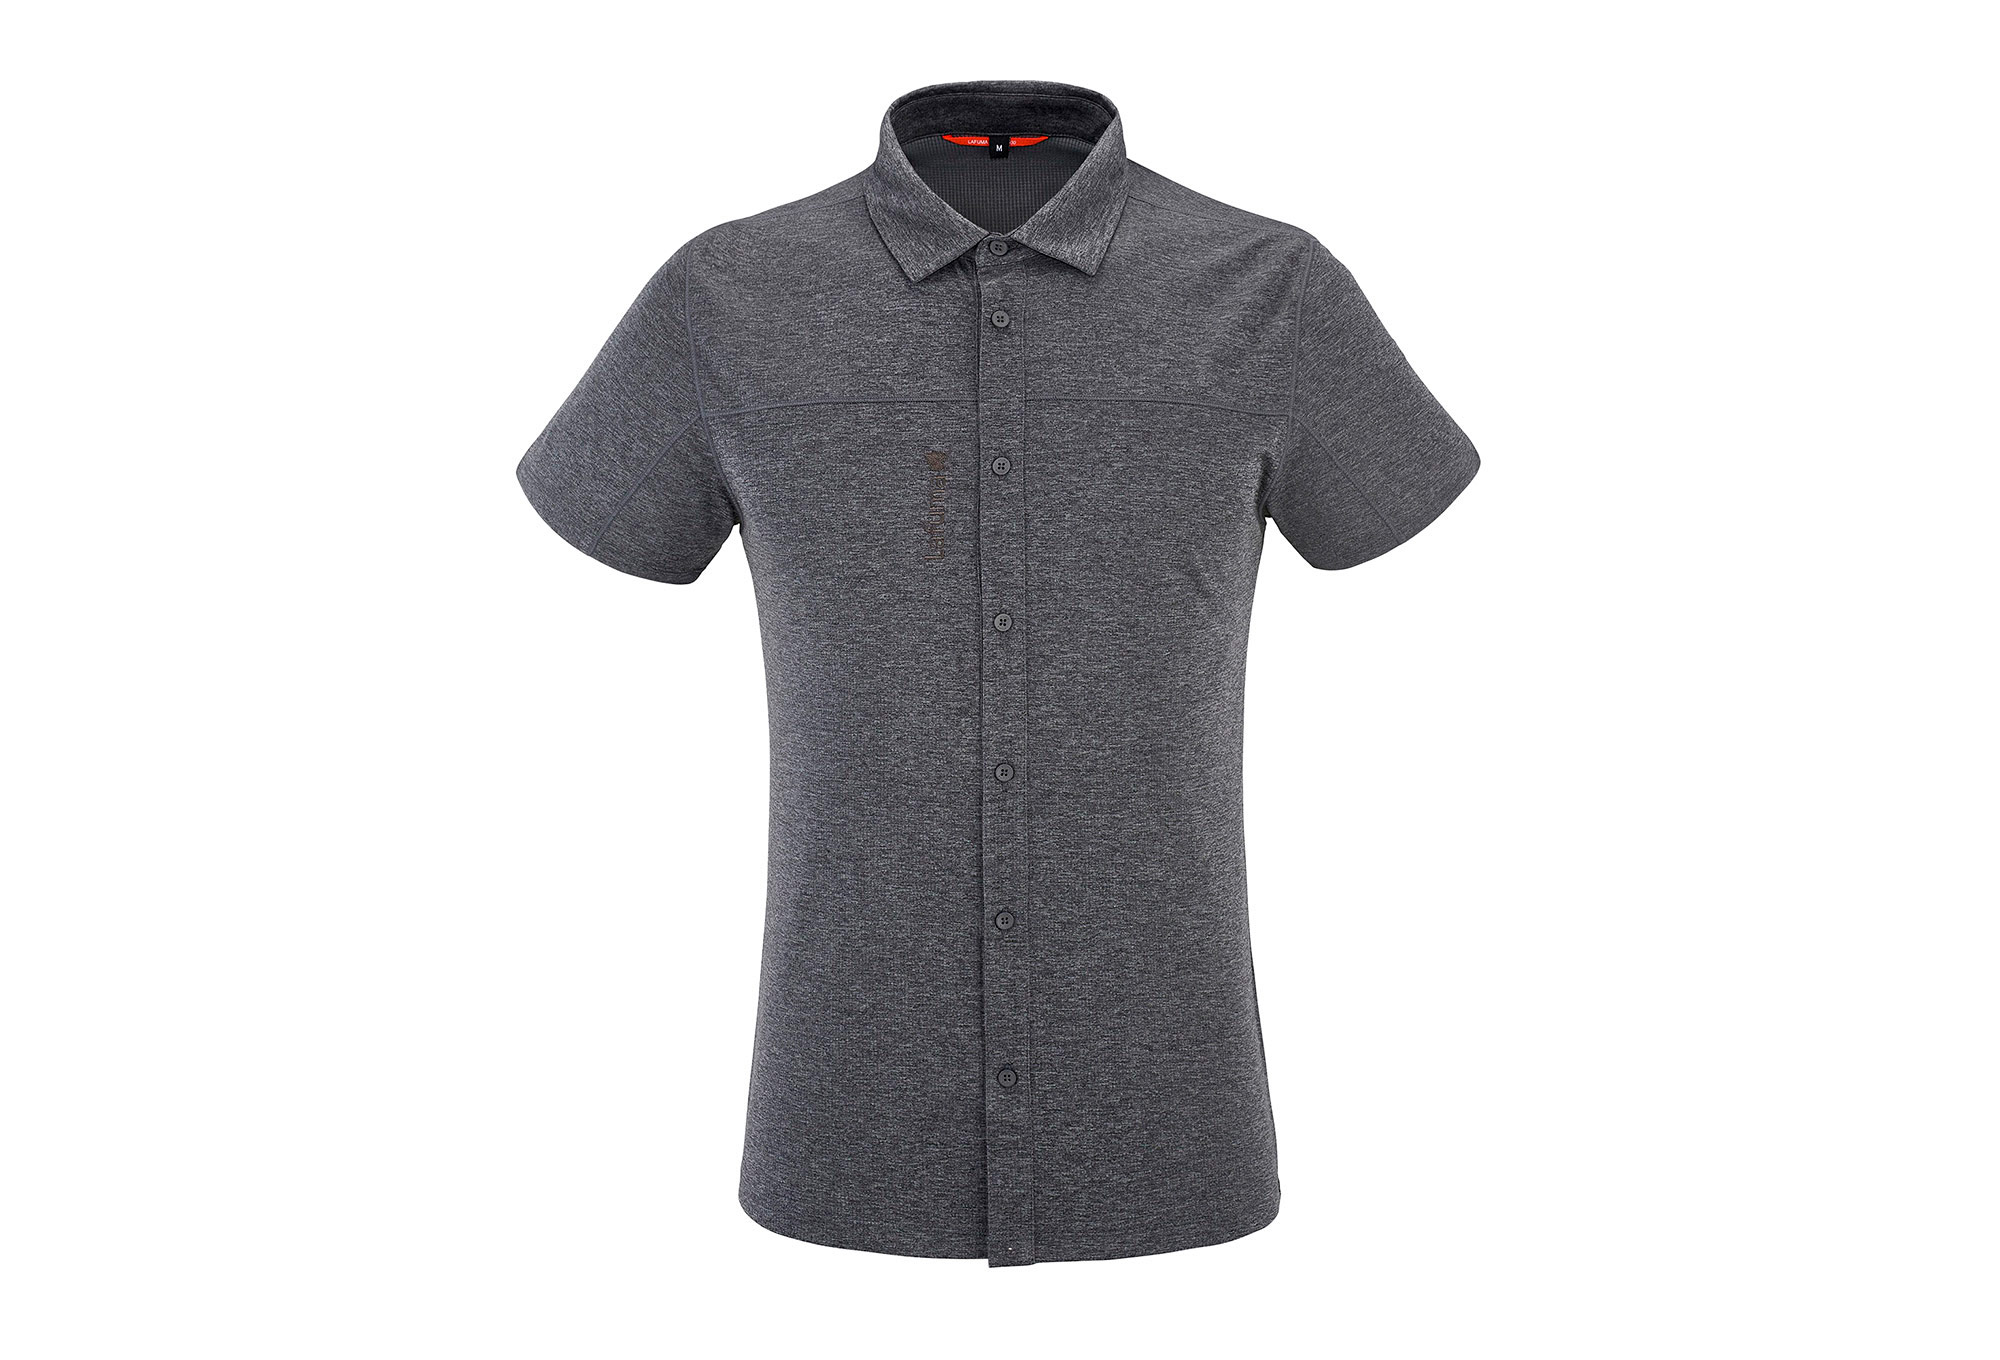 Practical Pull T.shirt Ml Calvin Klein Marron Chocolat Taille Xl 40 Femmes: Vêtements 42 Tbe Autres